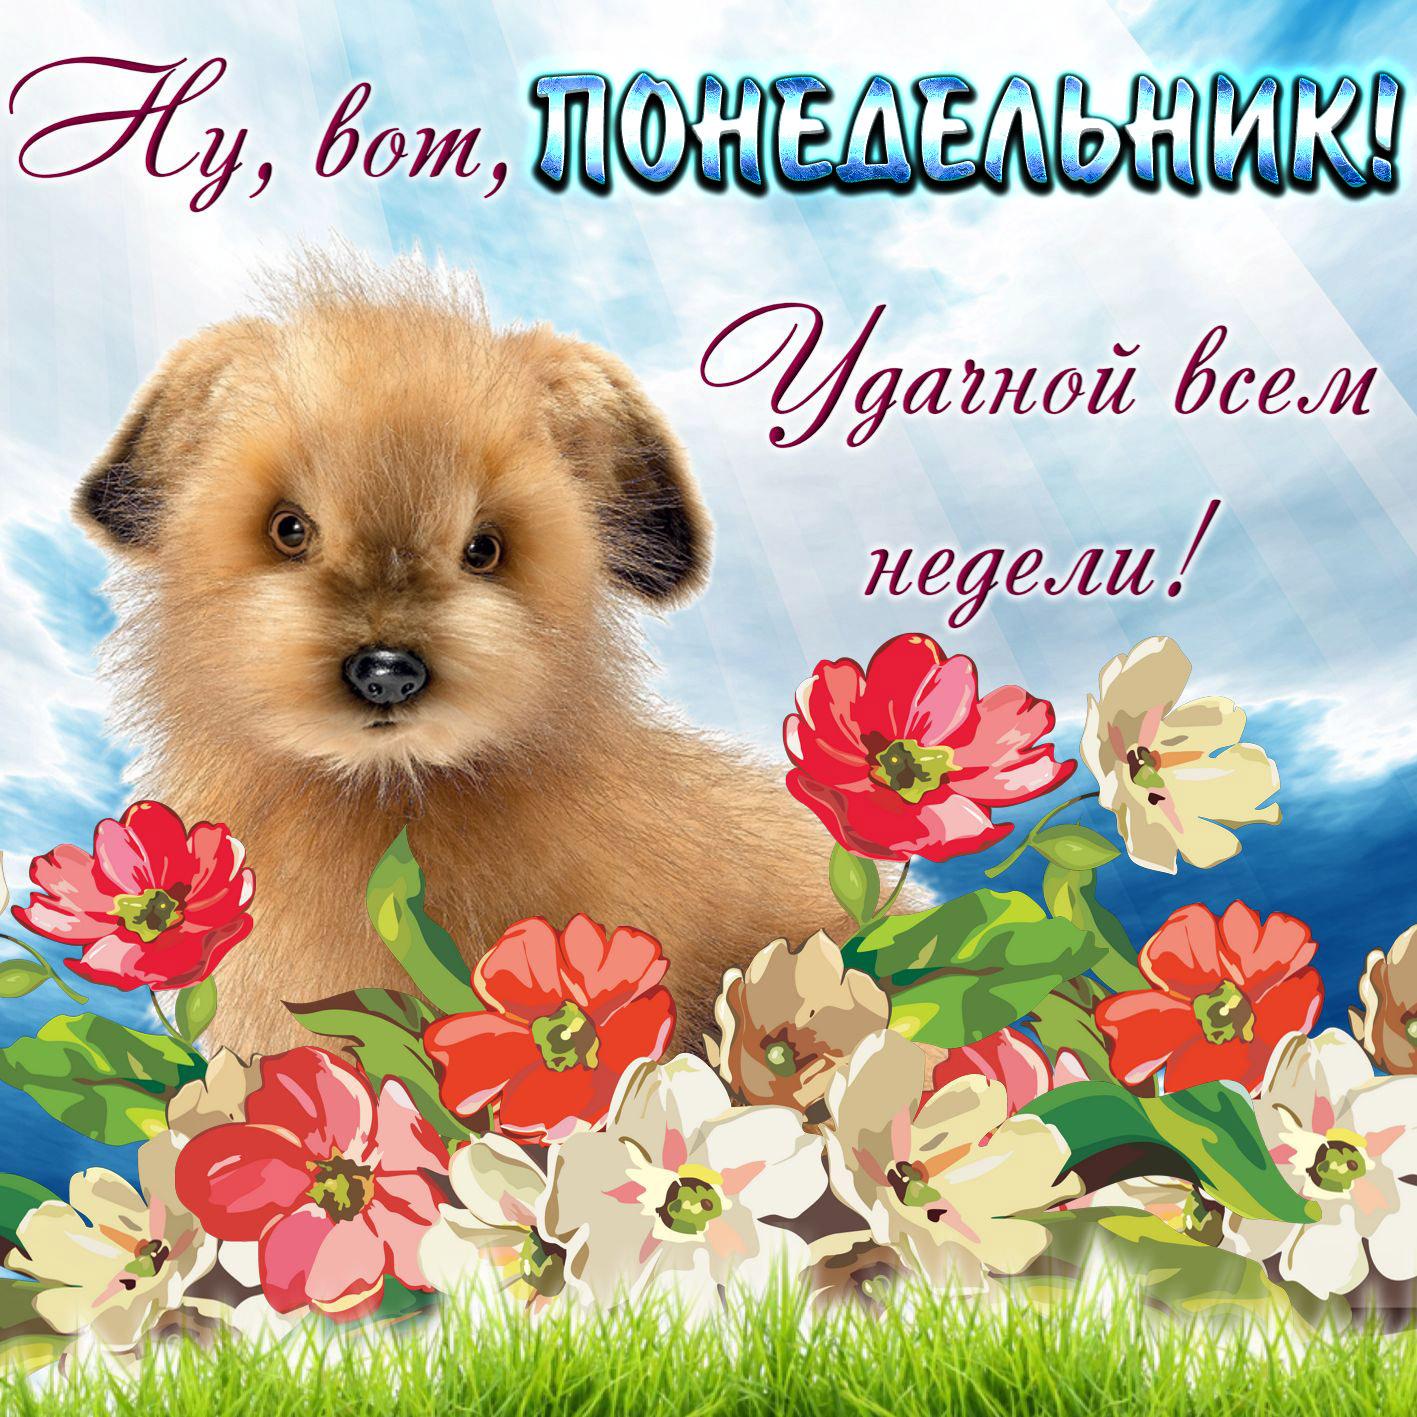 Вконтакте открытка